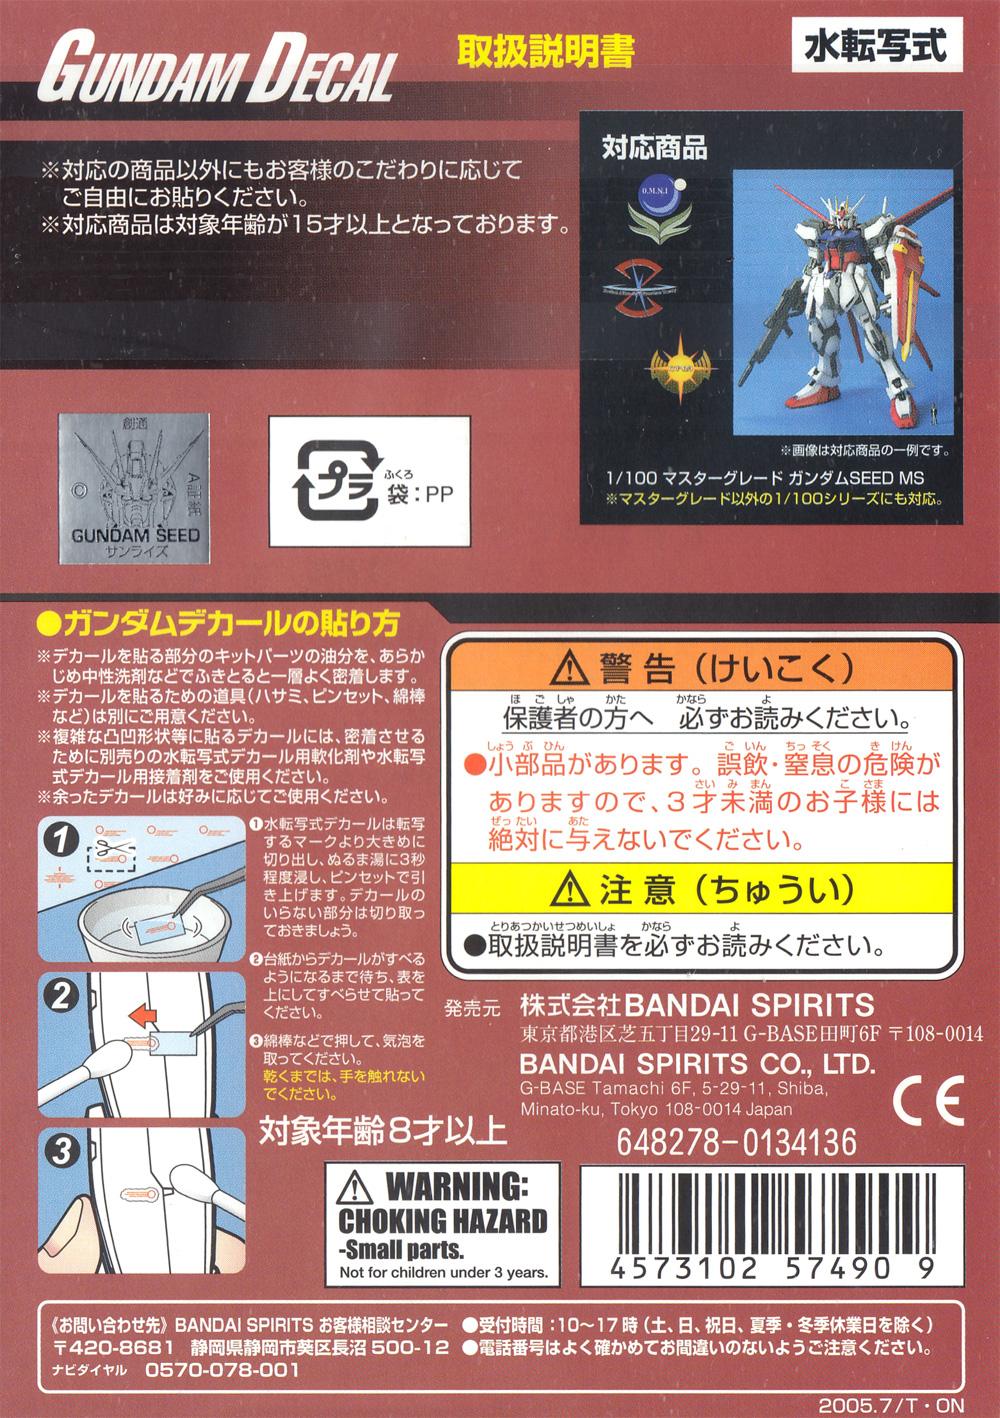 SEEDモビルスーツ用 ガンダムデカール 1デカール(バンダイガンダムデカールNo.018)商品画像_2